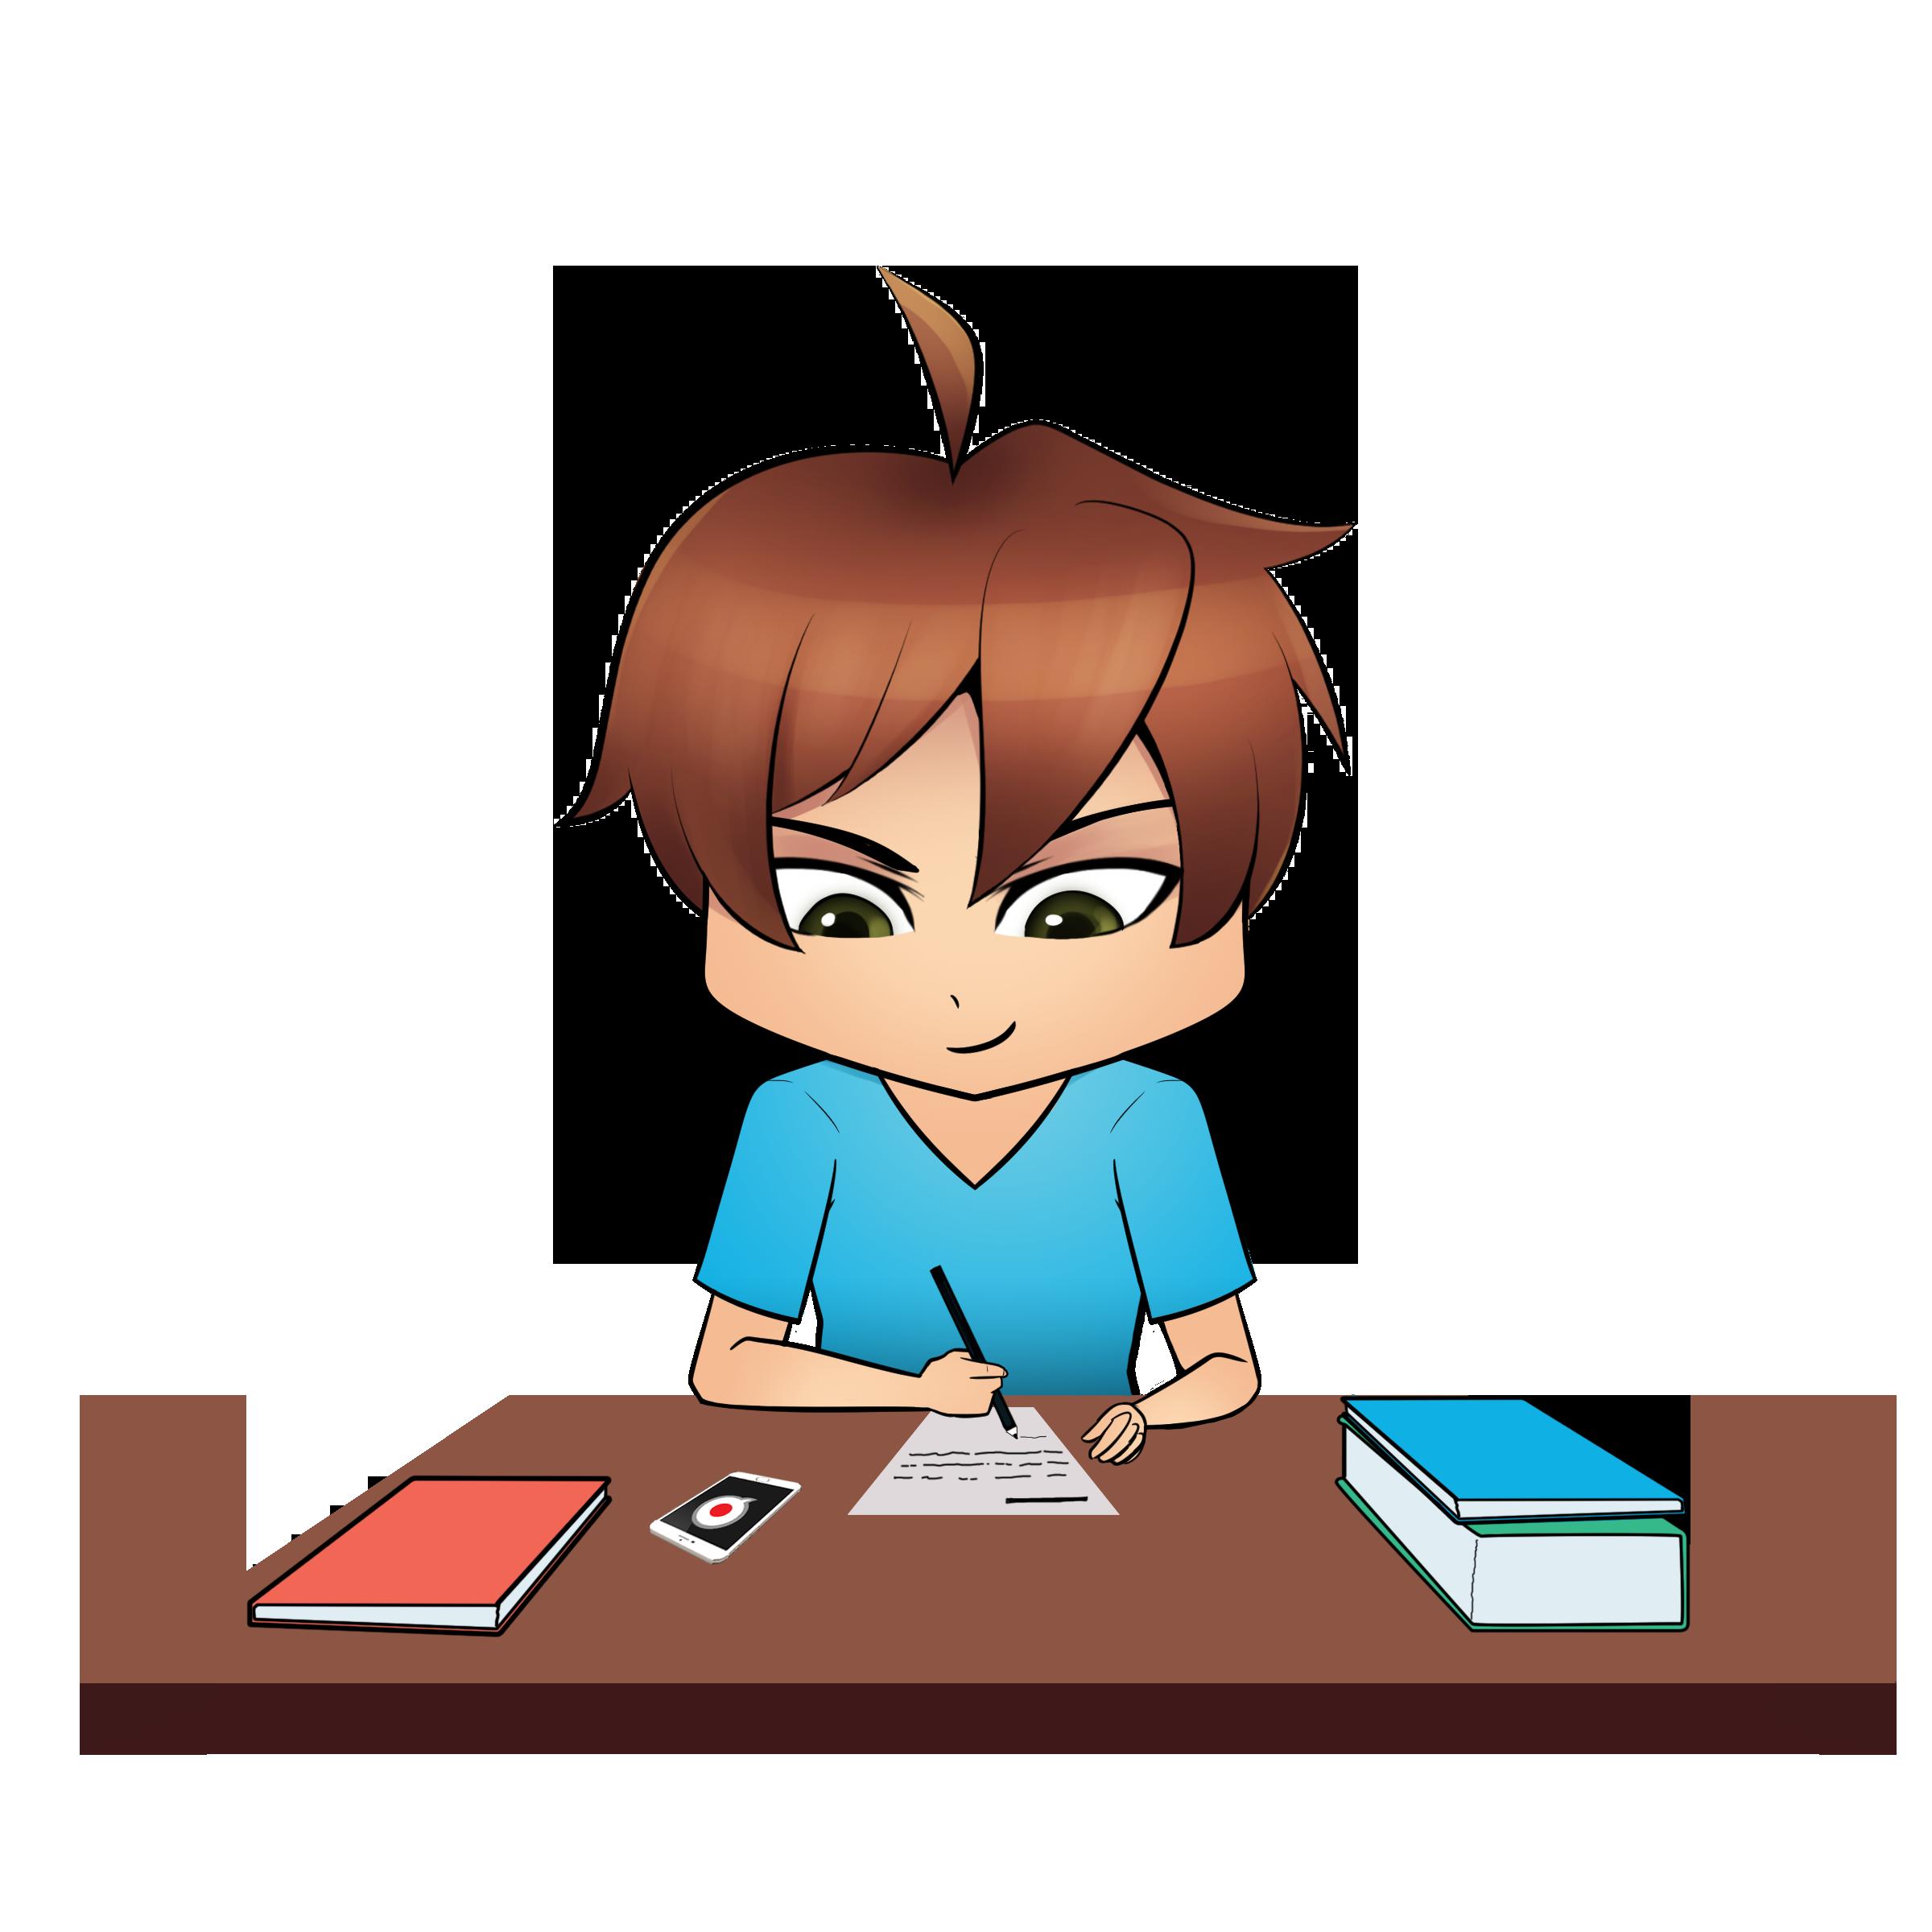 study for jlpt exam